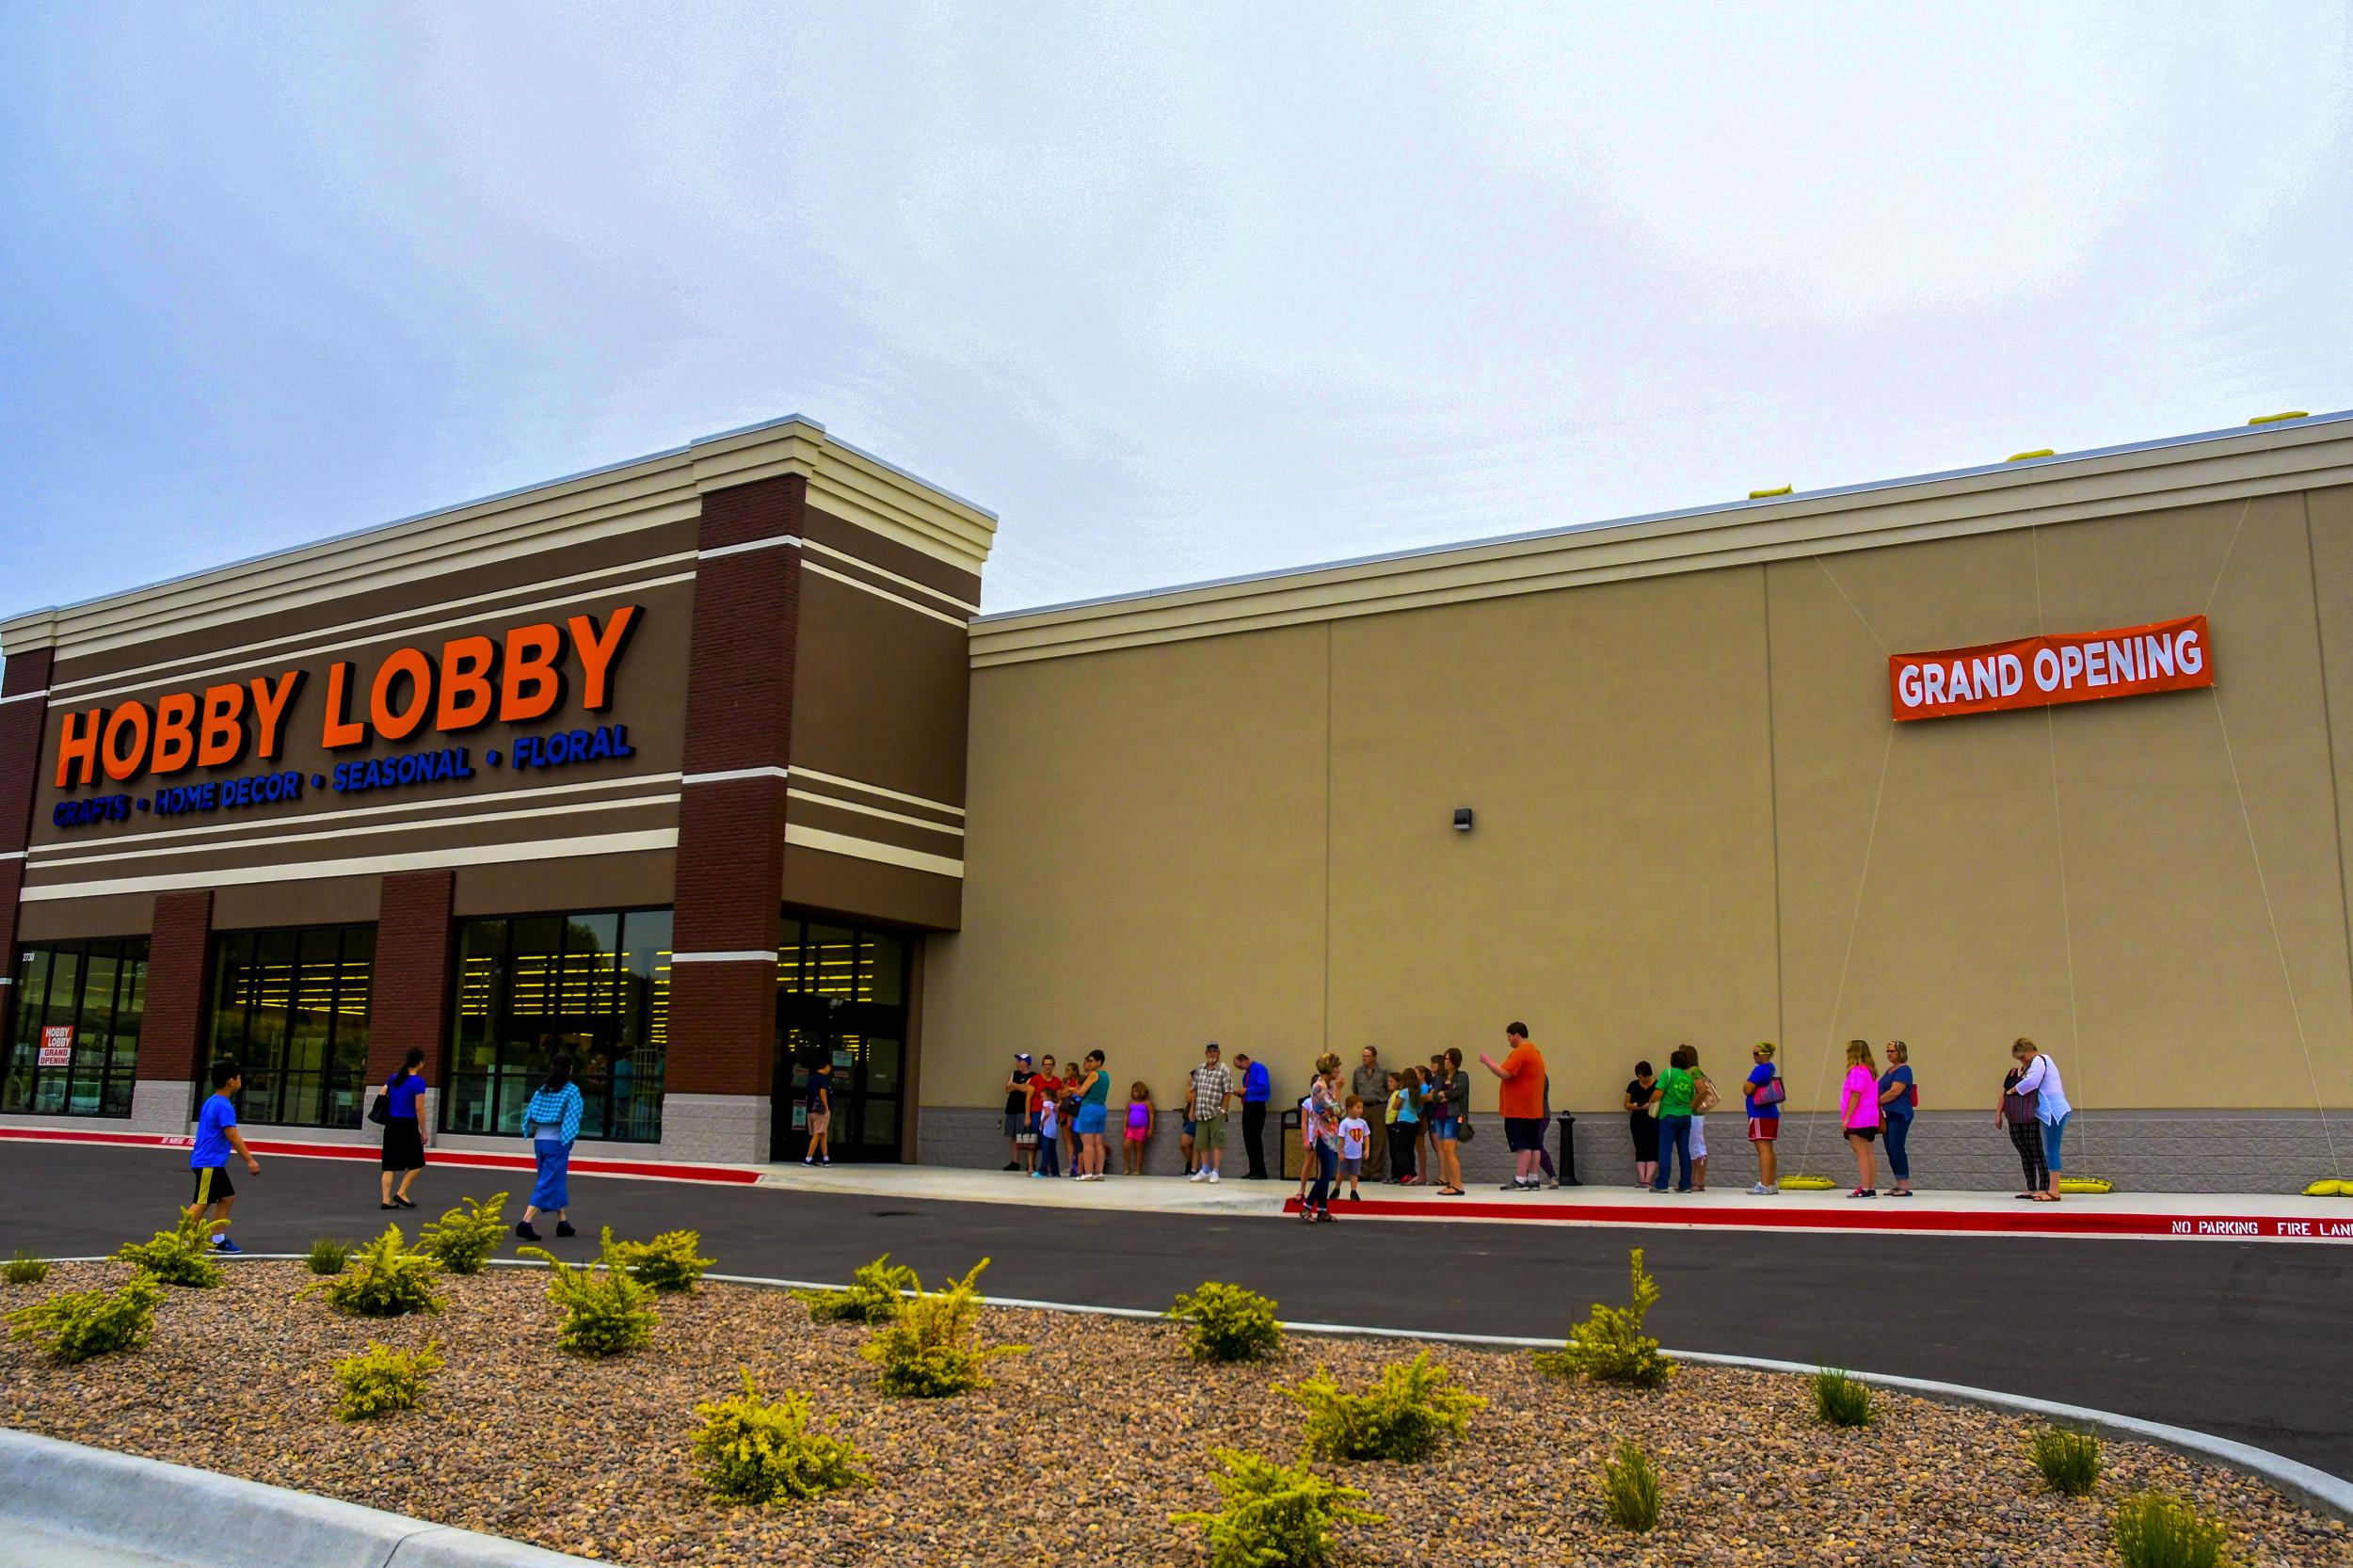 Labor Day 2019: Are Hobby Lobby, IKEA and Home Depot Open? on Hobby Lobby id=96630